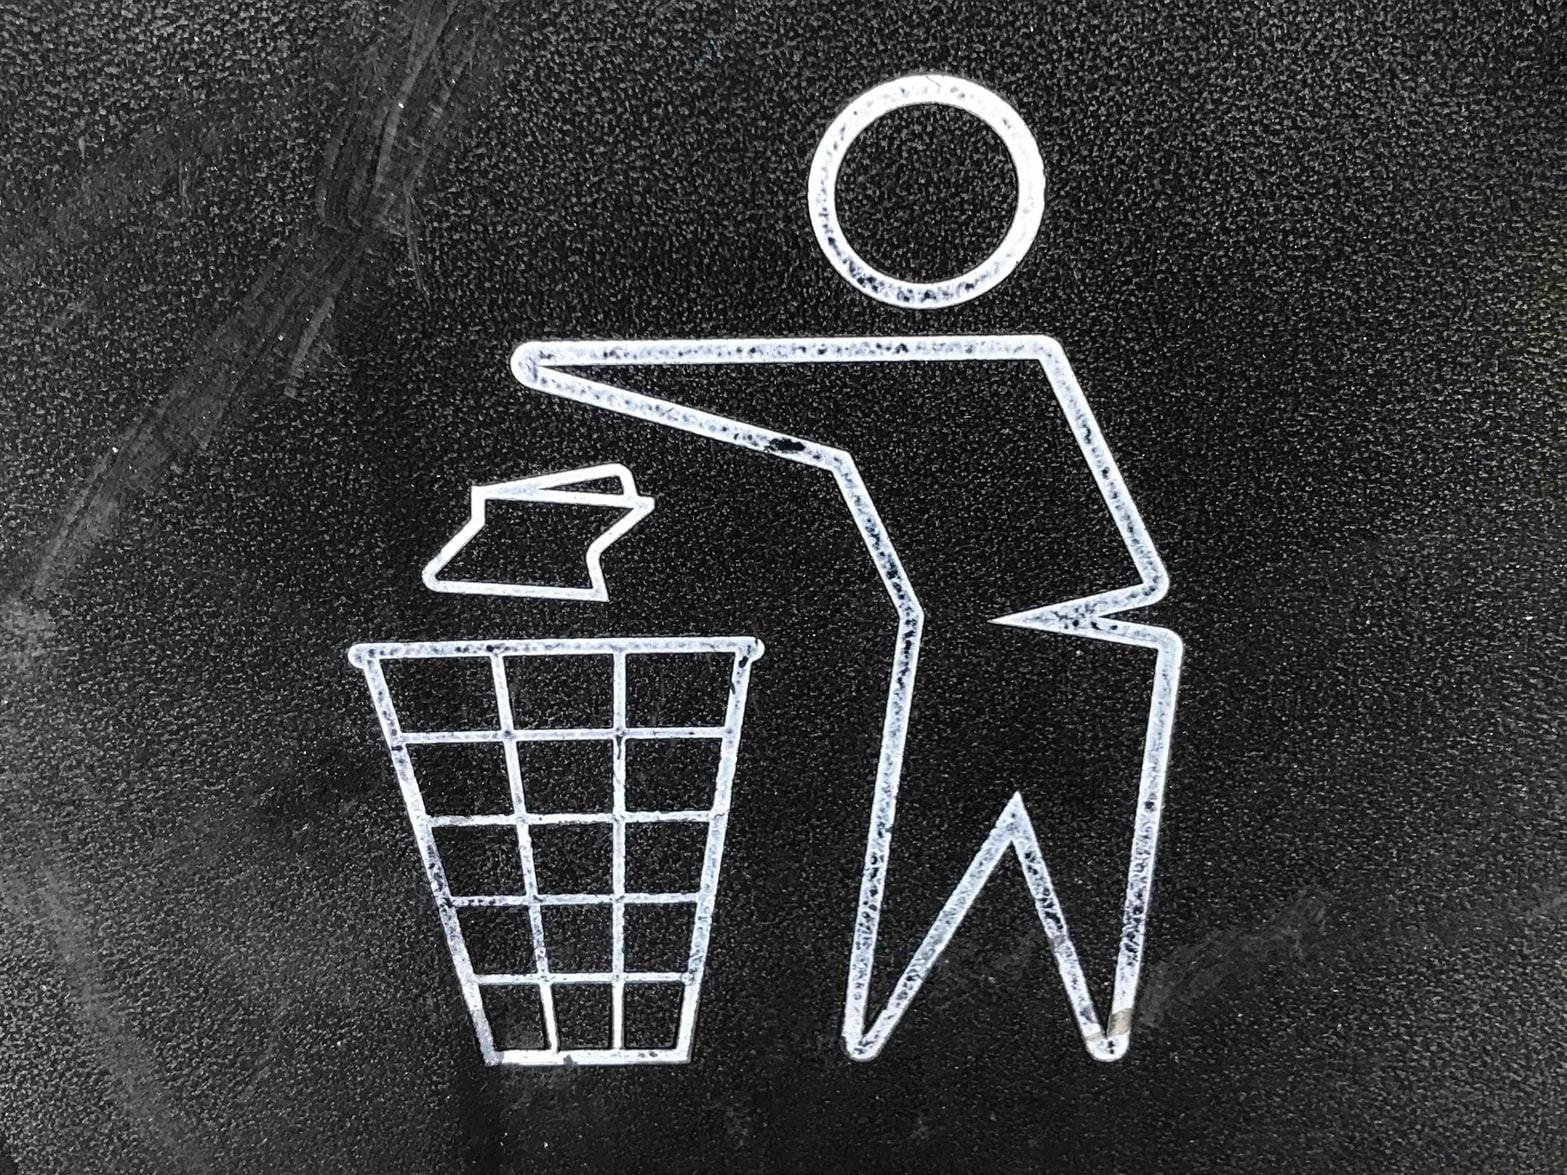 You Need to Lease a Skip Bin in Waurn Ponds to Clean Up